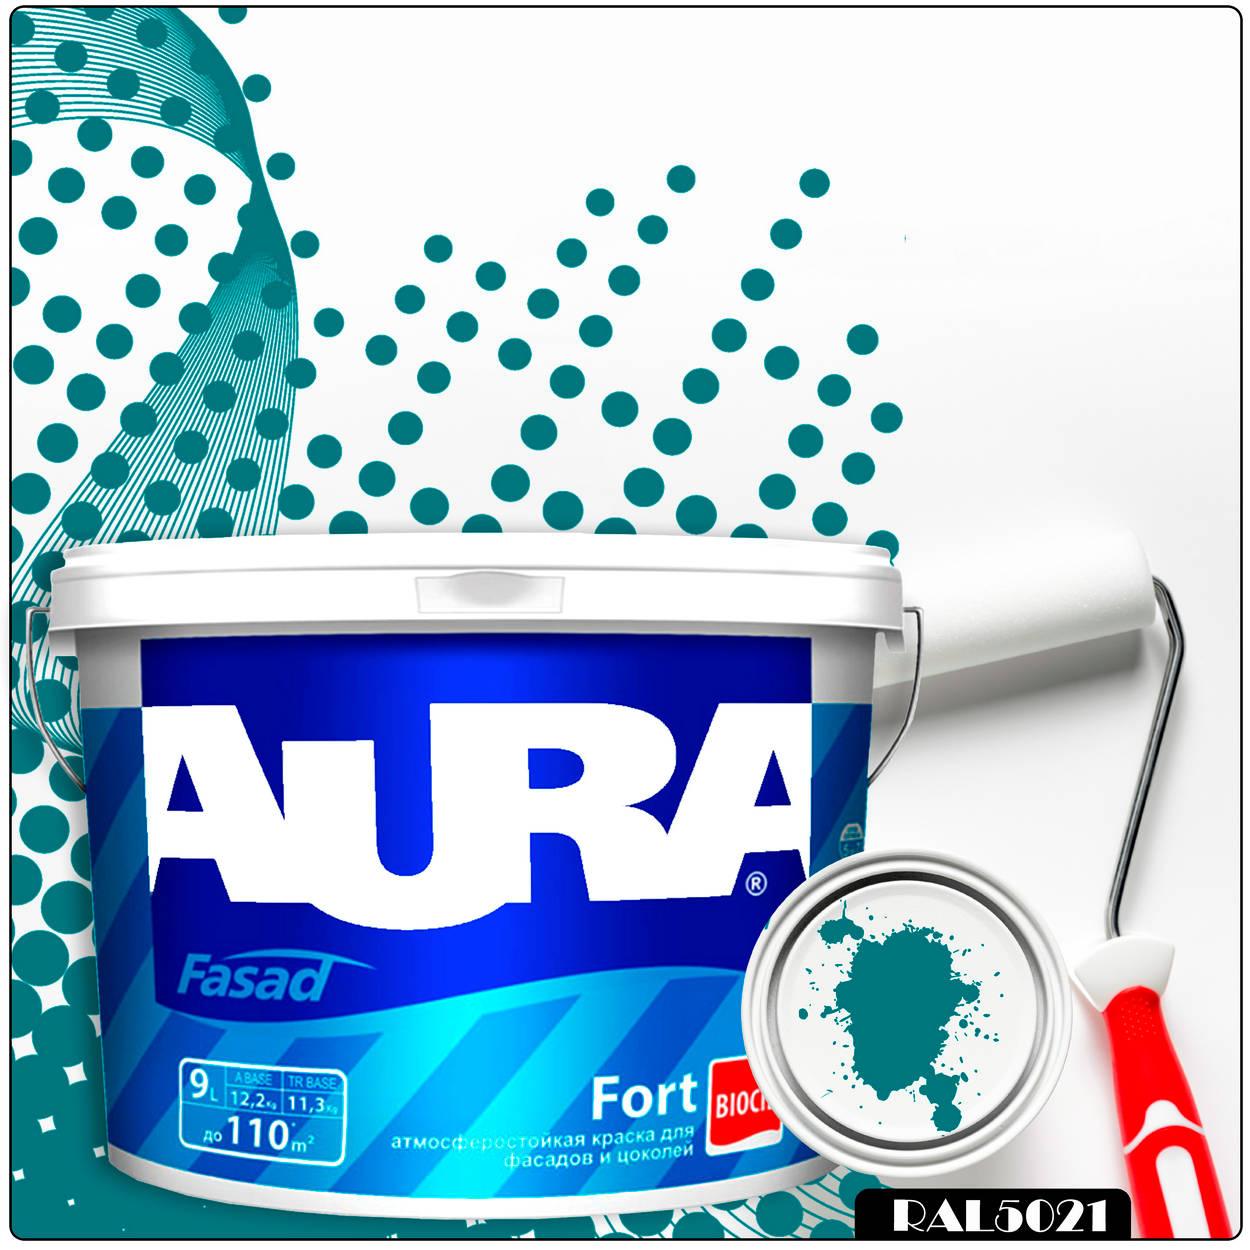 Фото 20 - Краска Aura Fasad Fort, RAL 5021 Водянисто-синий, латексная, матовая, для фасада и цоколей, 9л, Аура.